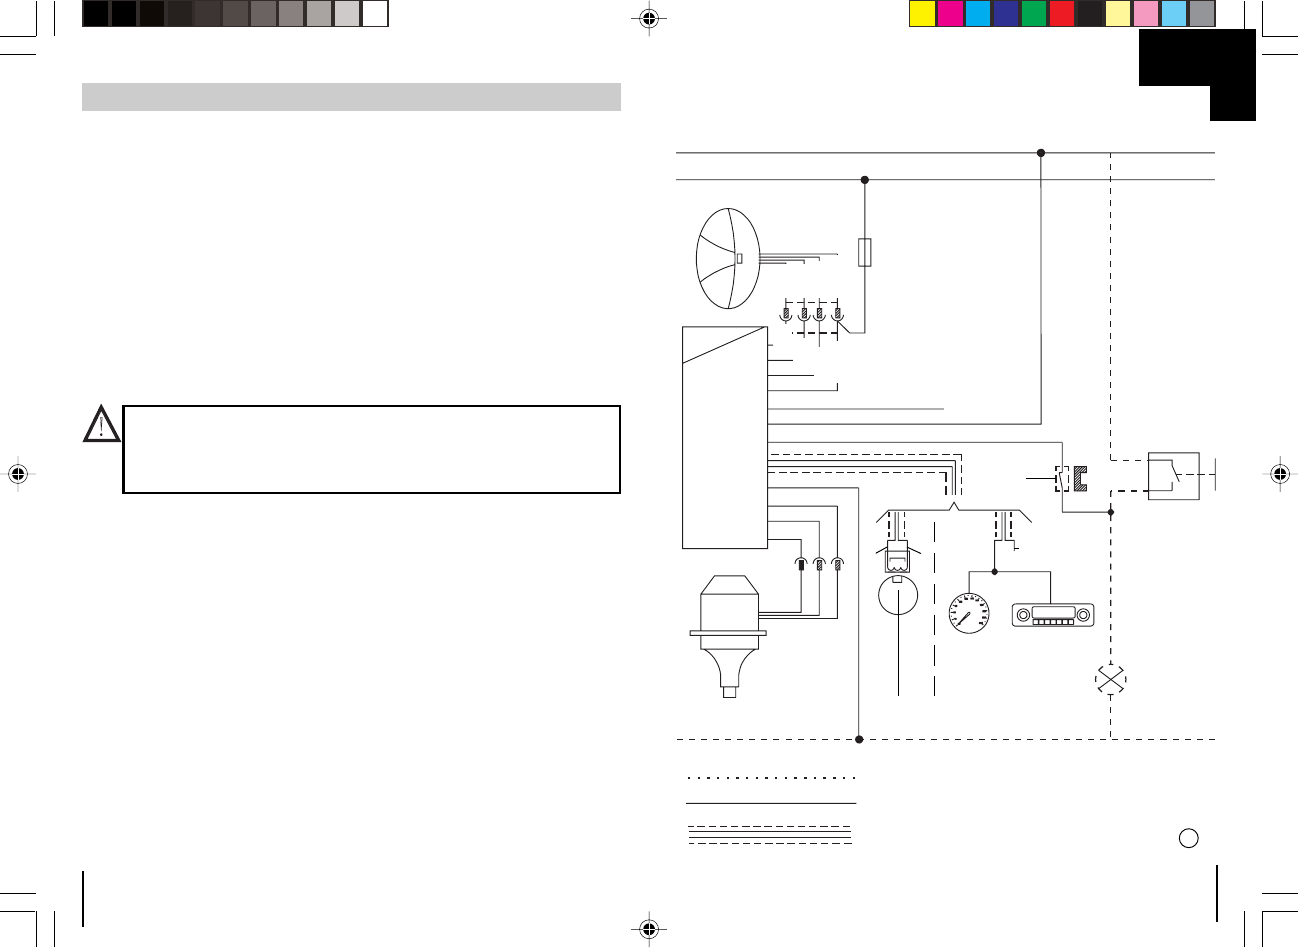 handleiding waeco ms 50 cruise control magic speed pagina 9 van 122 dansk english espan l. Black Bedroom Furniture Sets. Home Design Ideas